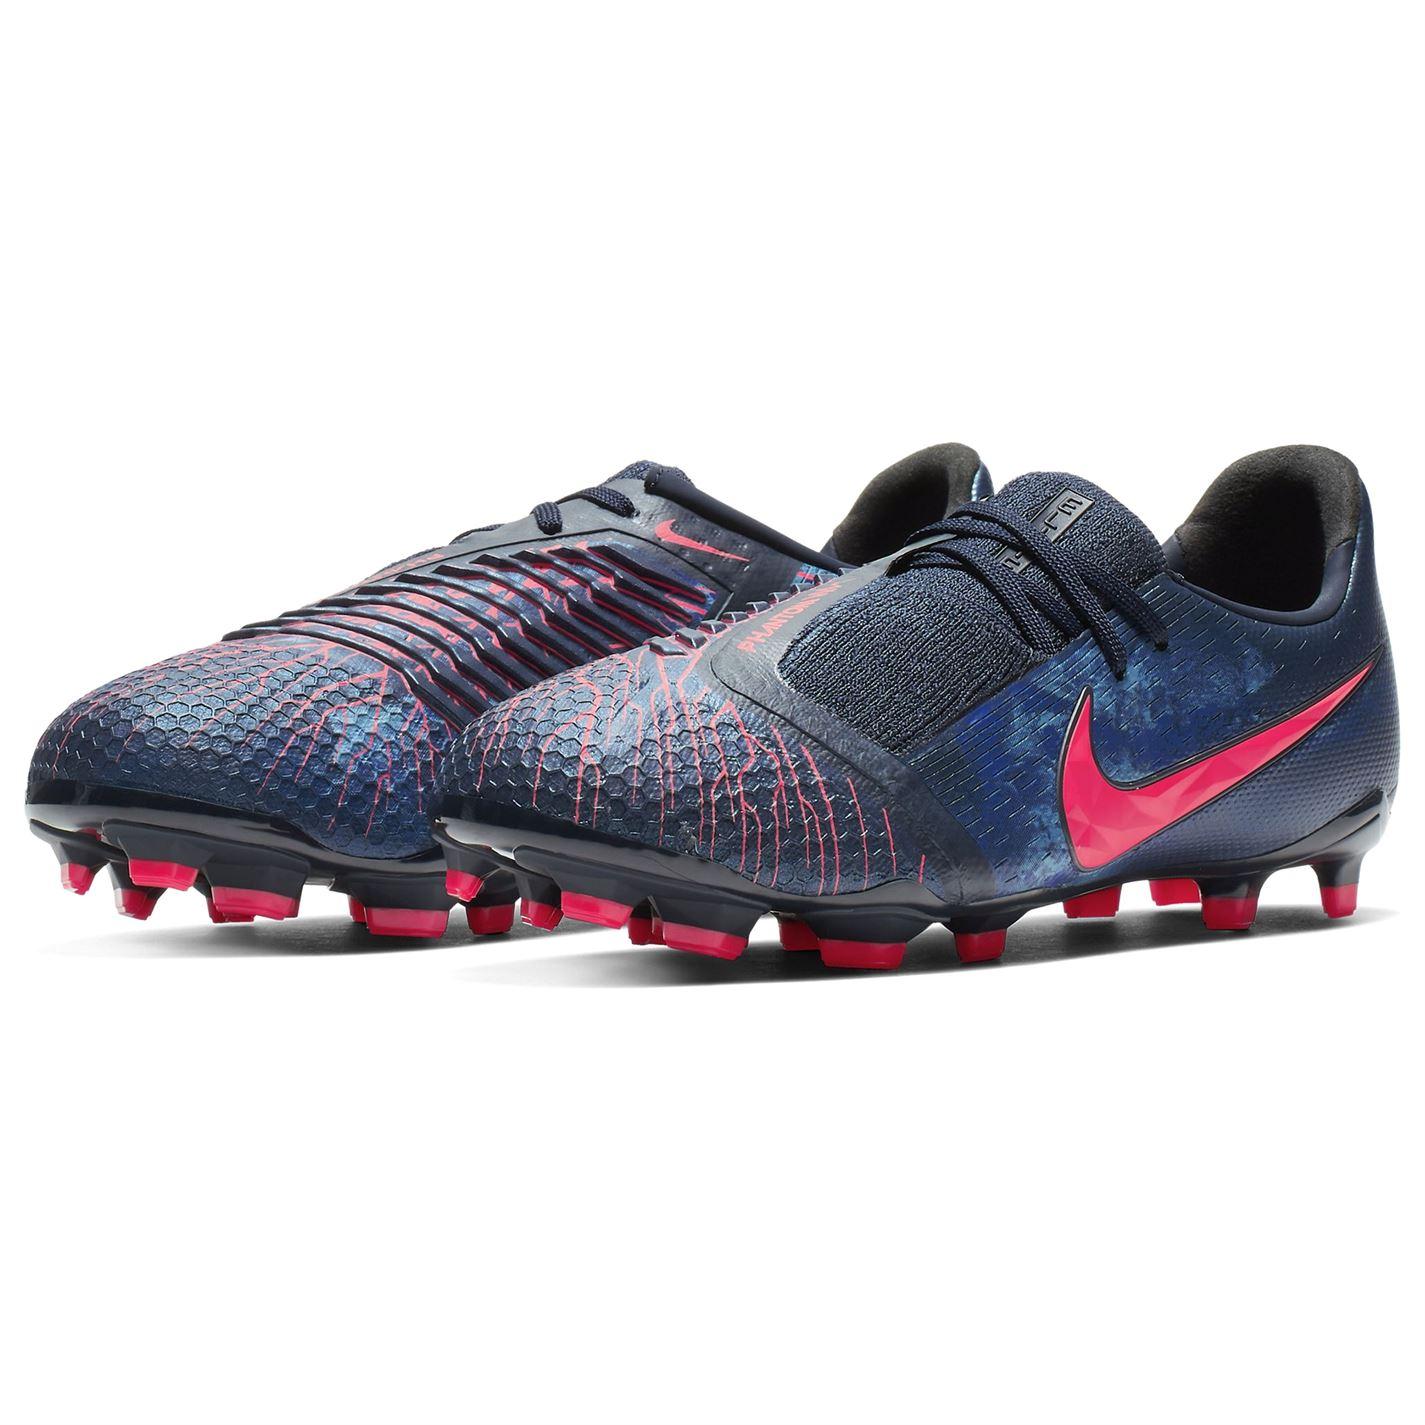 a02171241 Nike Phantom Venom Elite Junior FG Football Boots